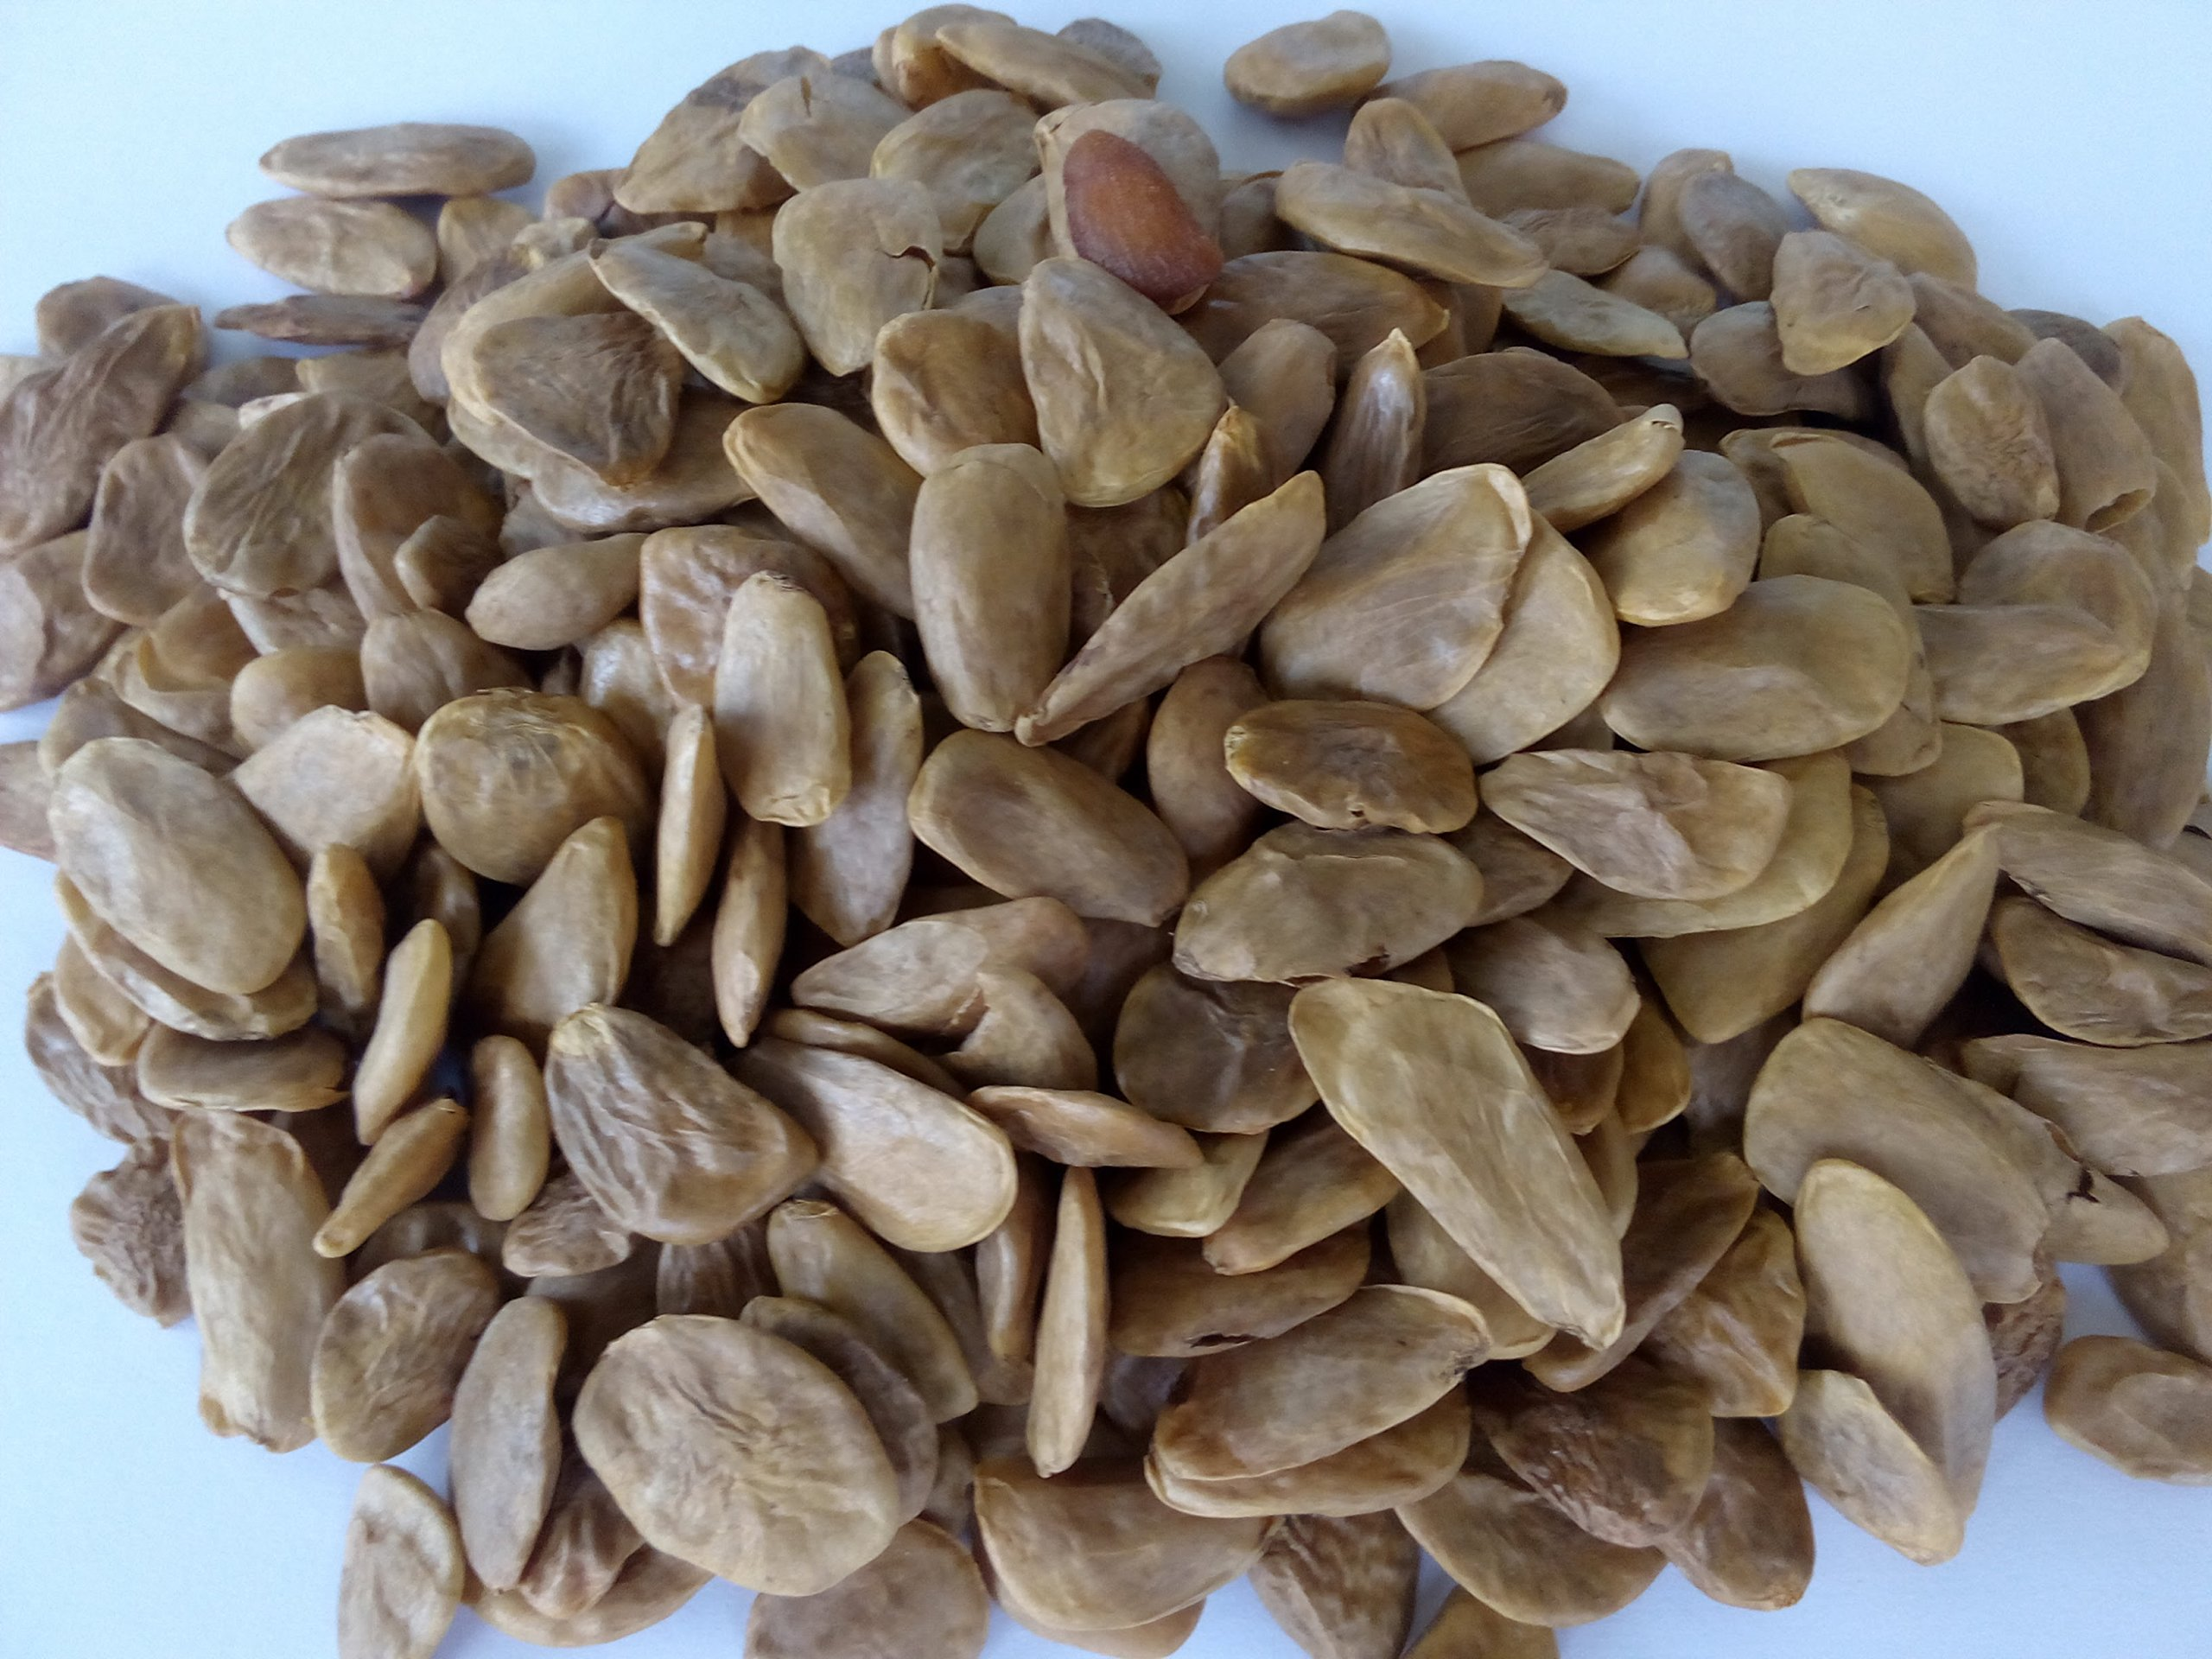 Akuamma (Picralima Nitida) Seeds 1000g